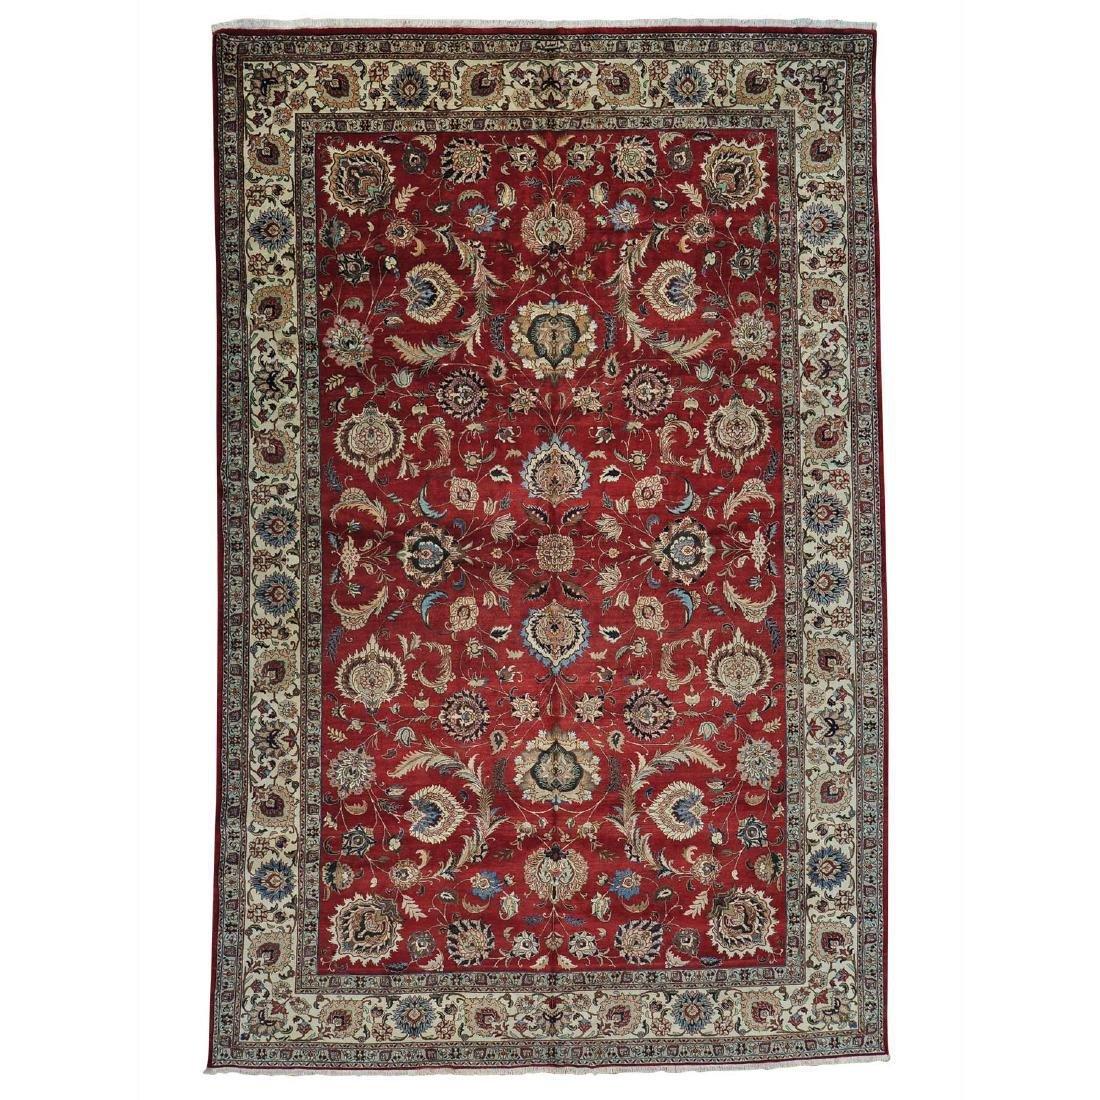 Semi Antique Persian Tabriz Handmade Rug 11.6x17.7